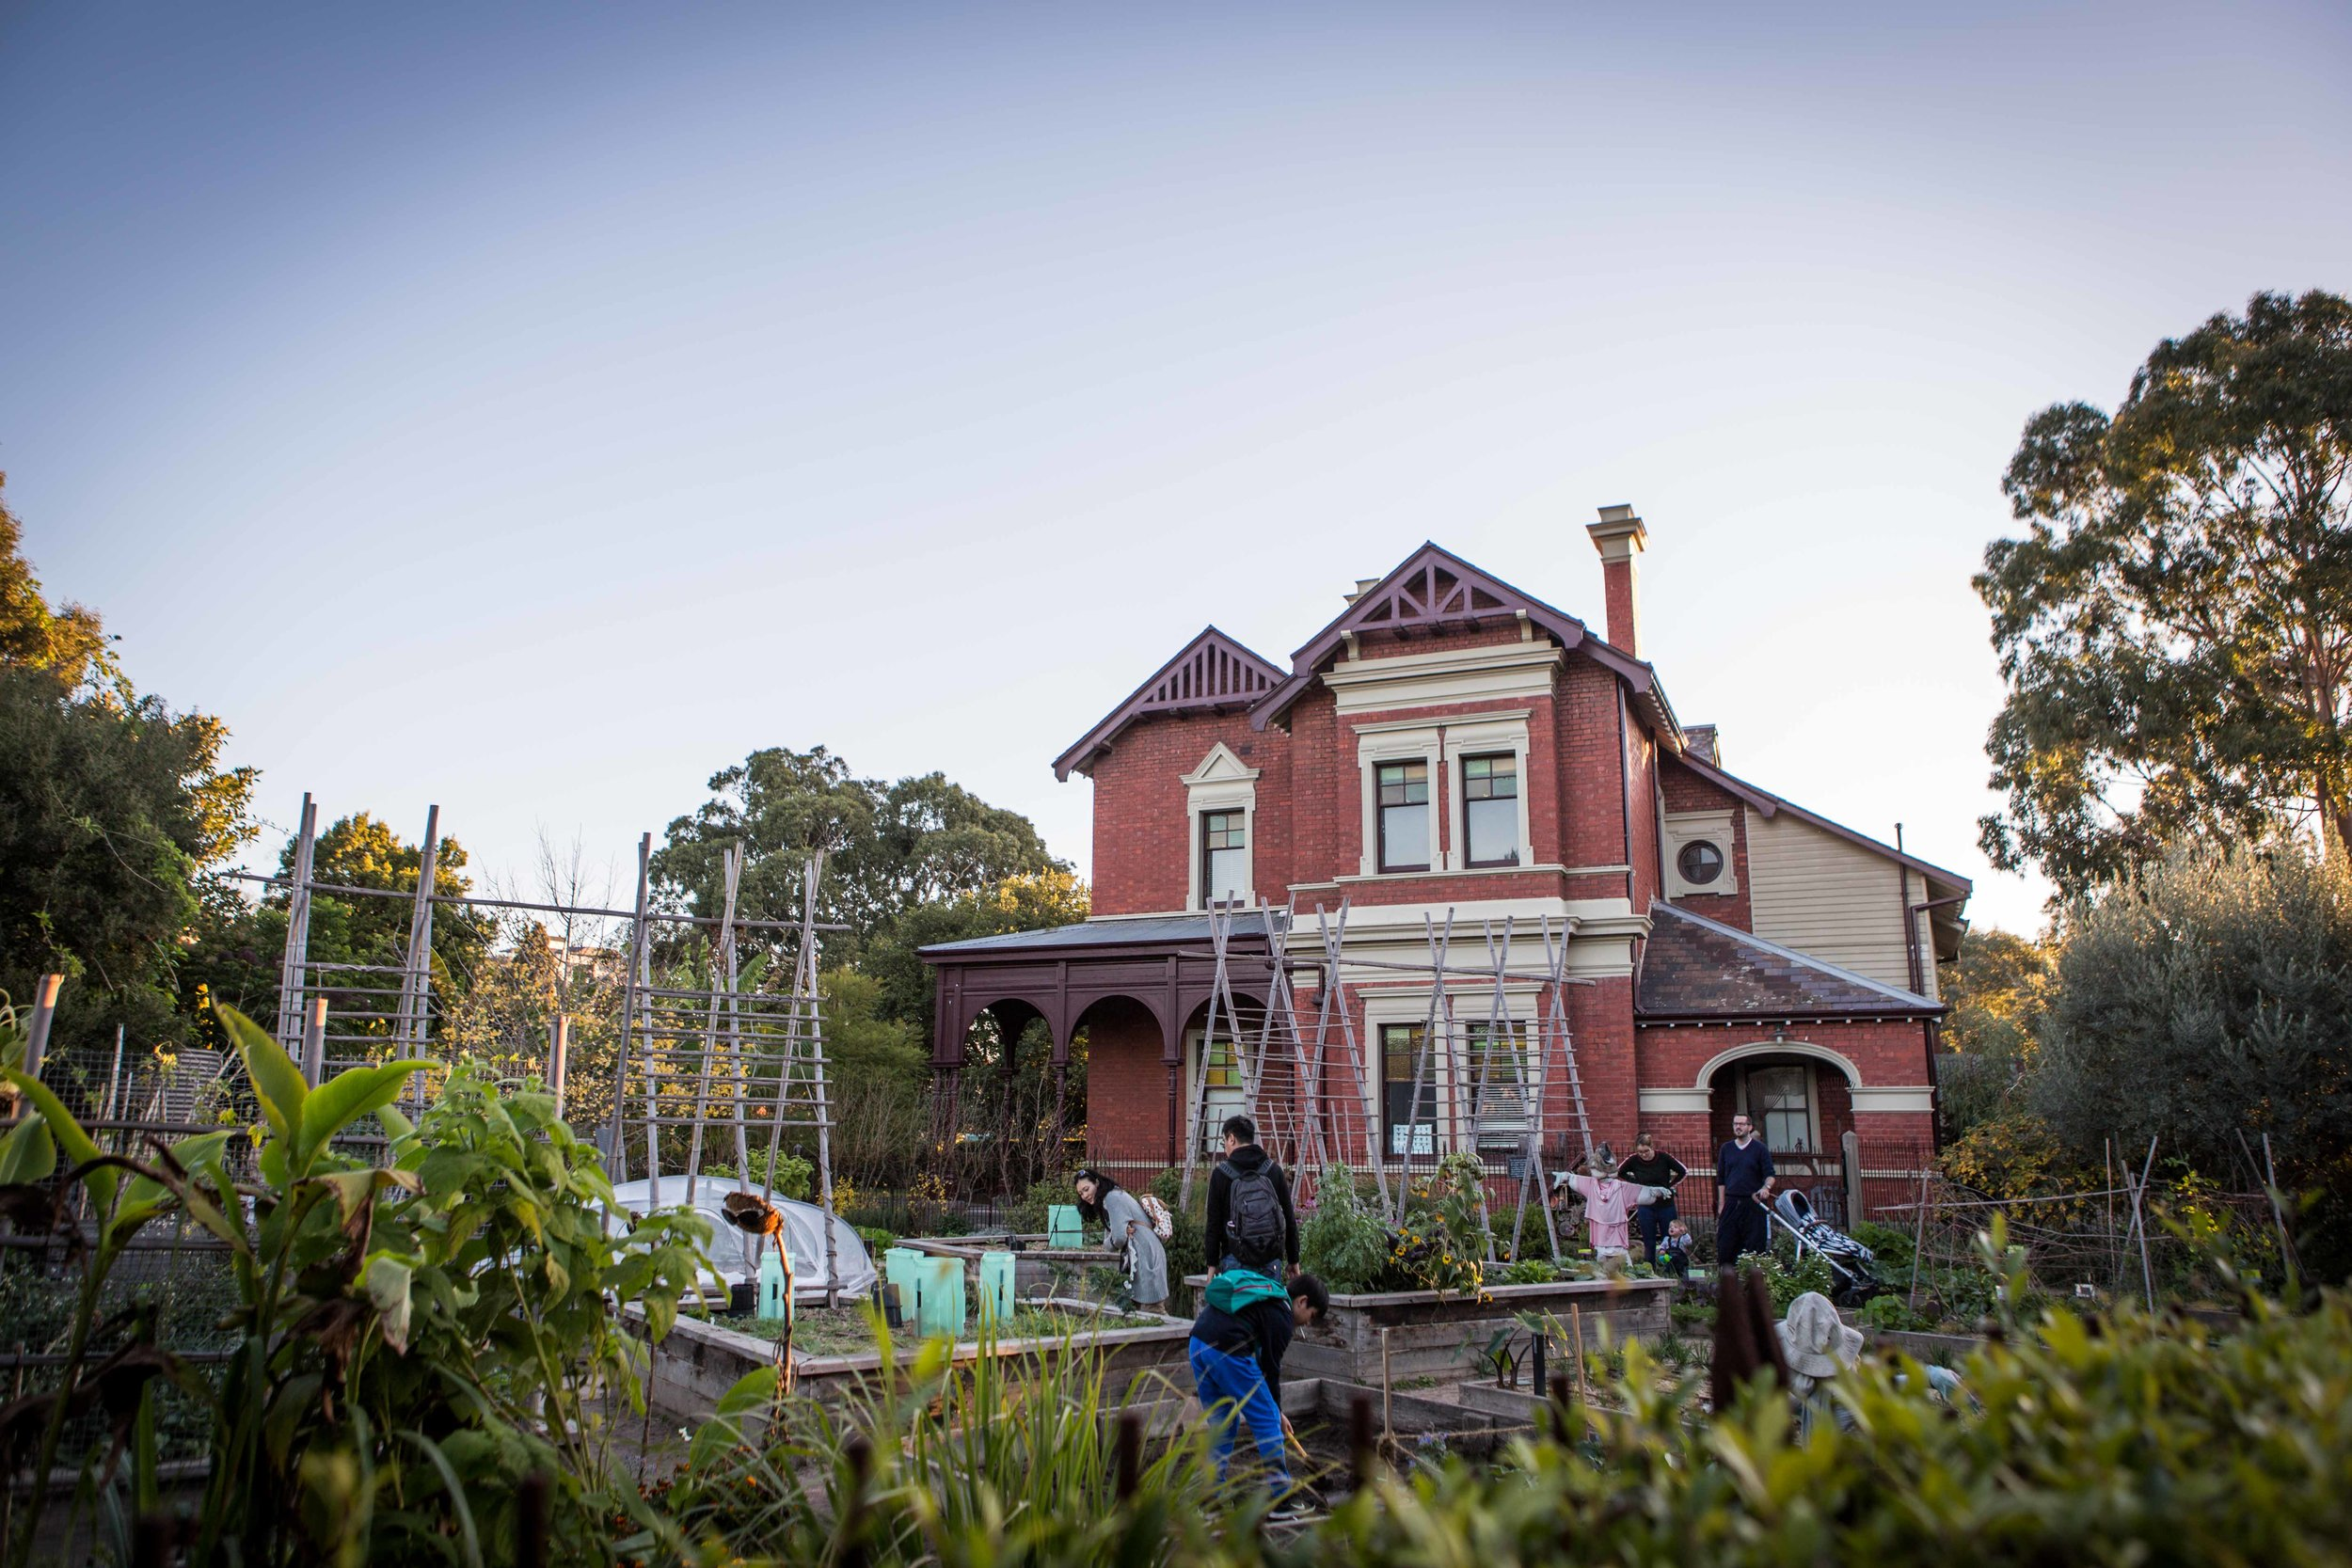 Royal Botanic Gardens Victoria Melbourne 2019 - Mamma Knows East (58 of 59).jpg